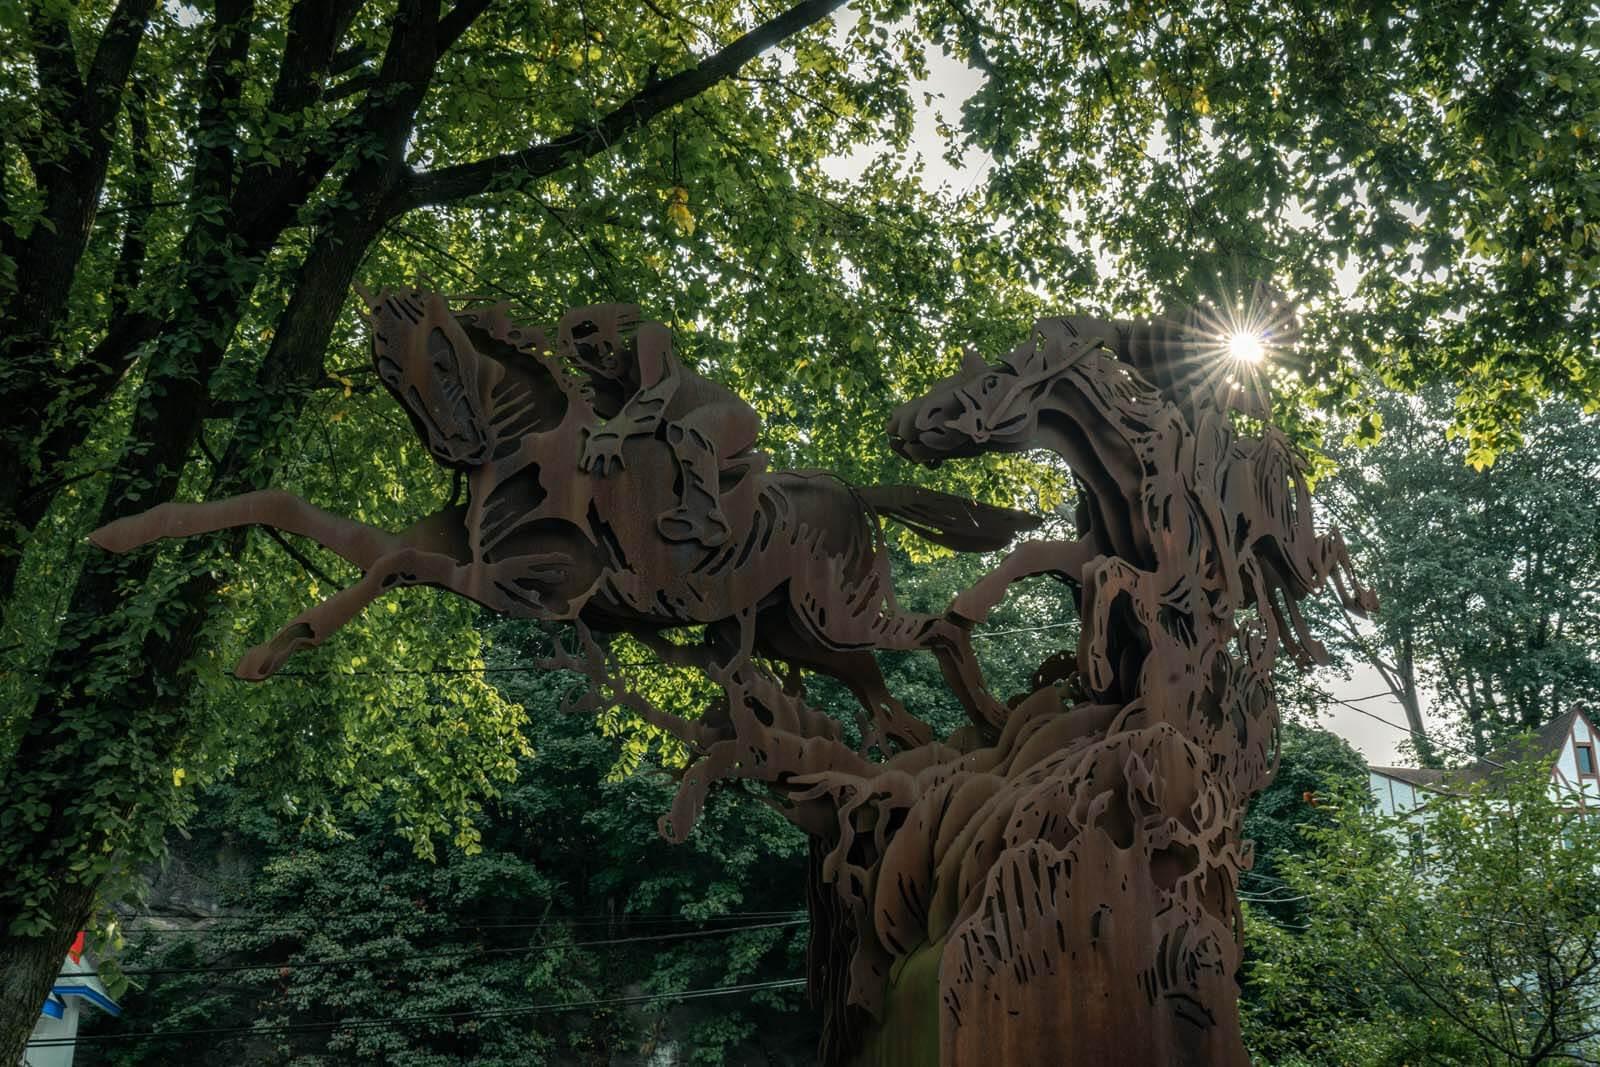 Sleepy Hollow Headless Horseman Sculpture in NY